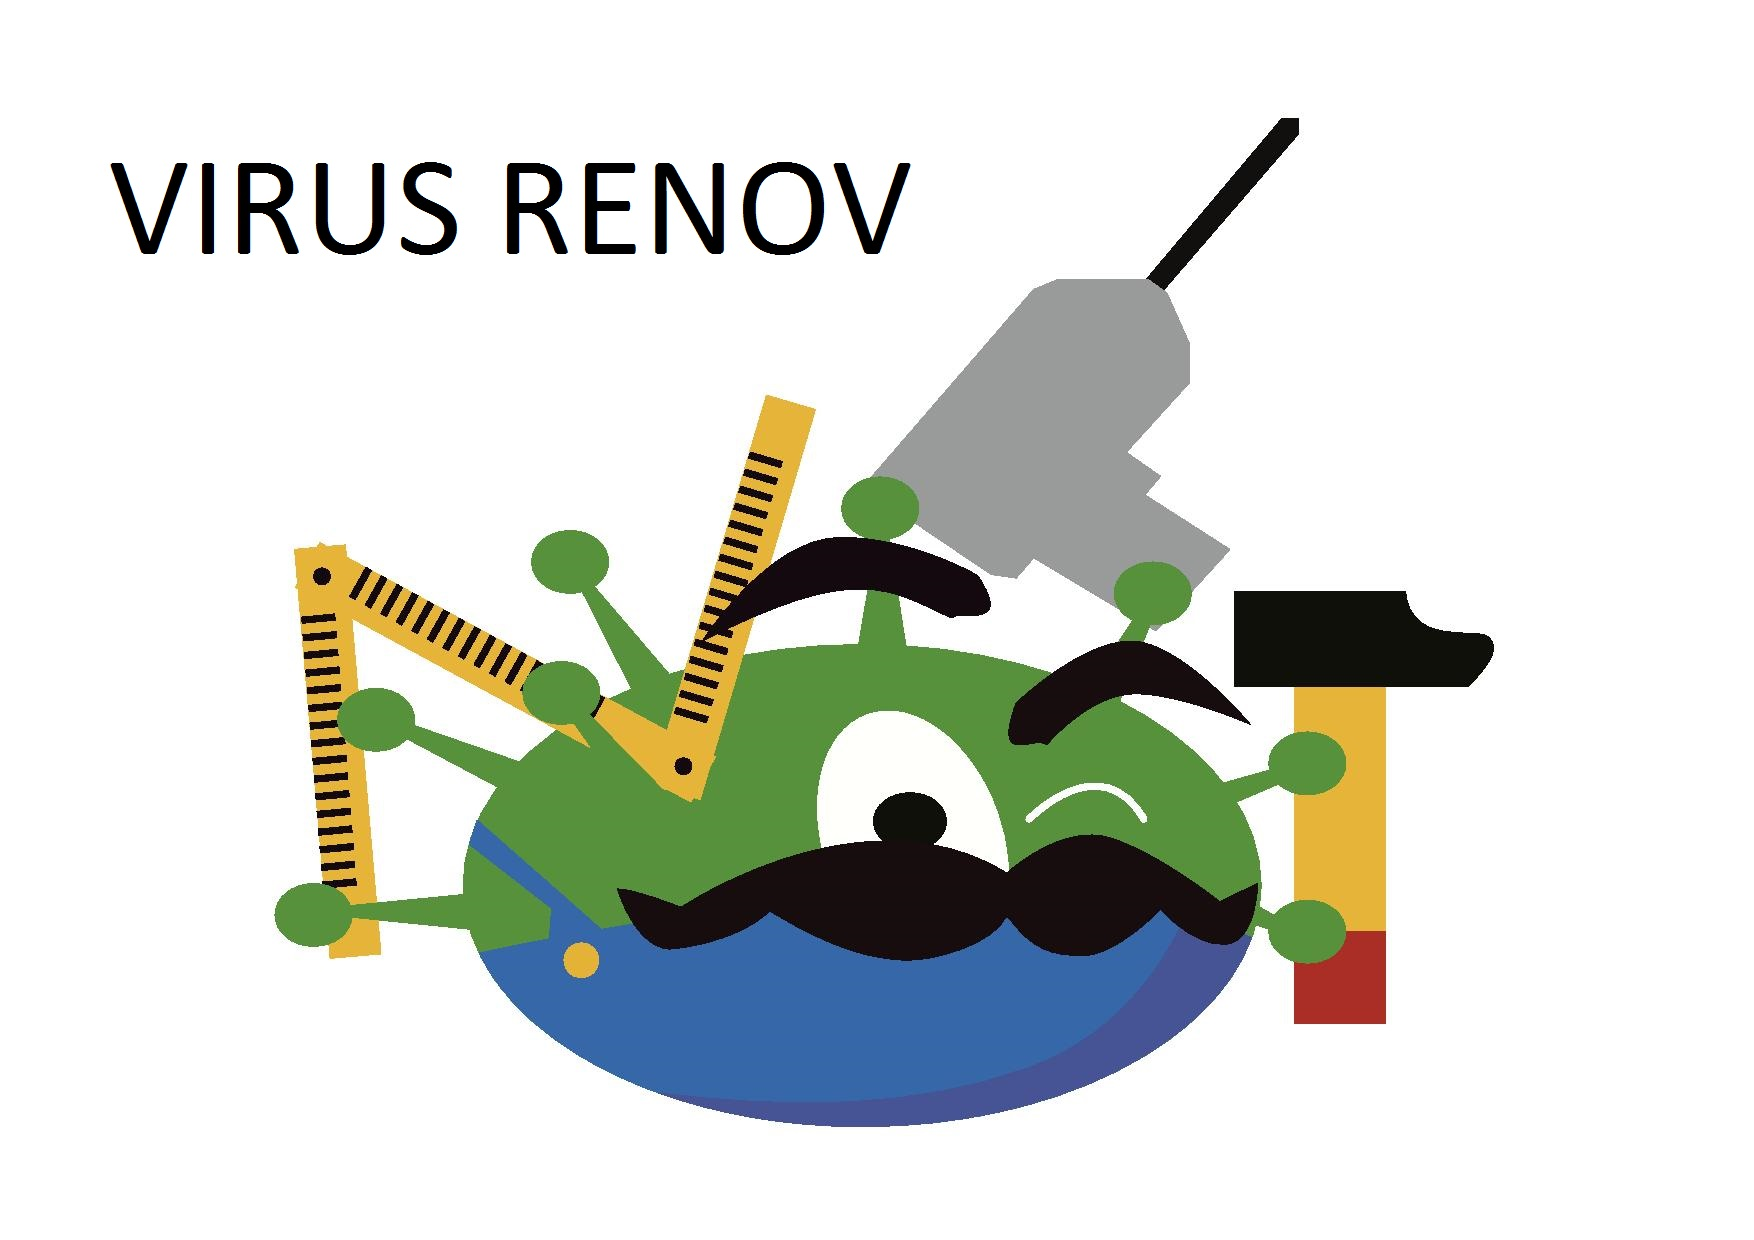 Virus renov